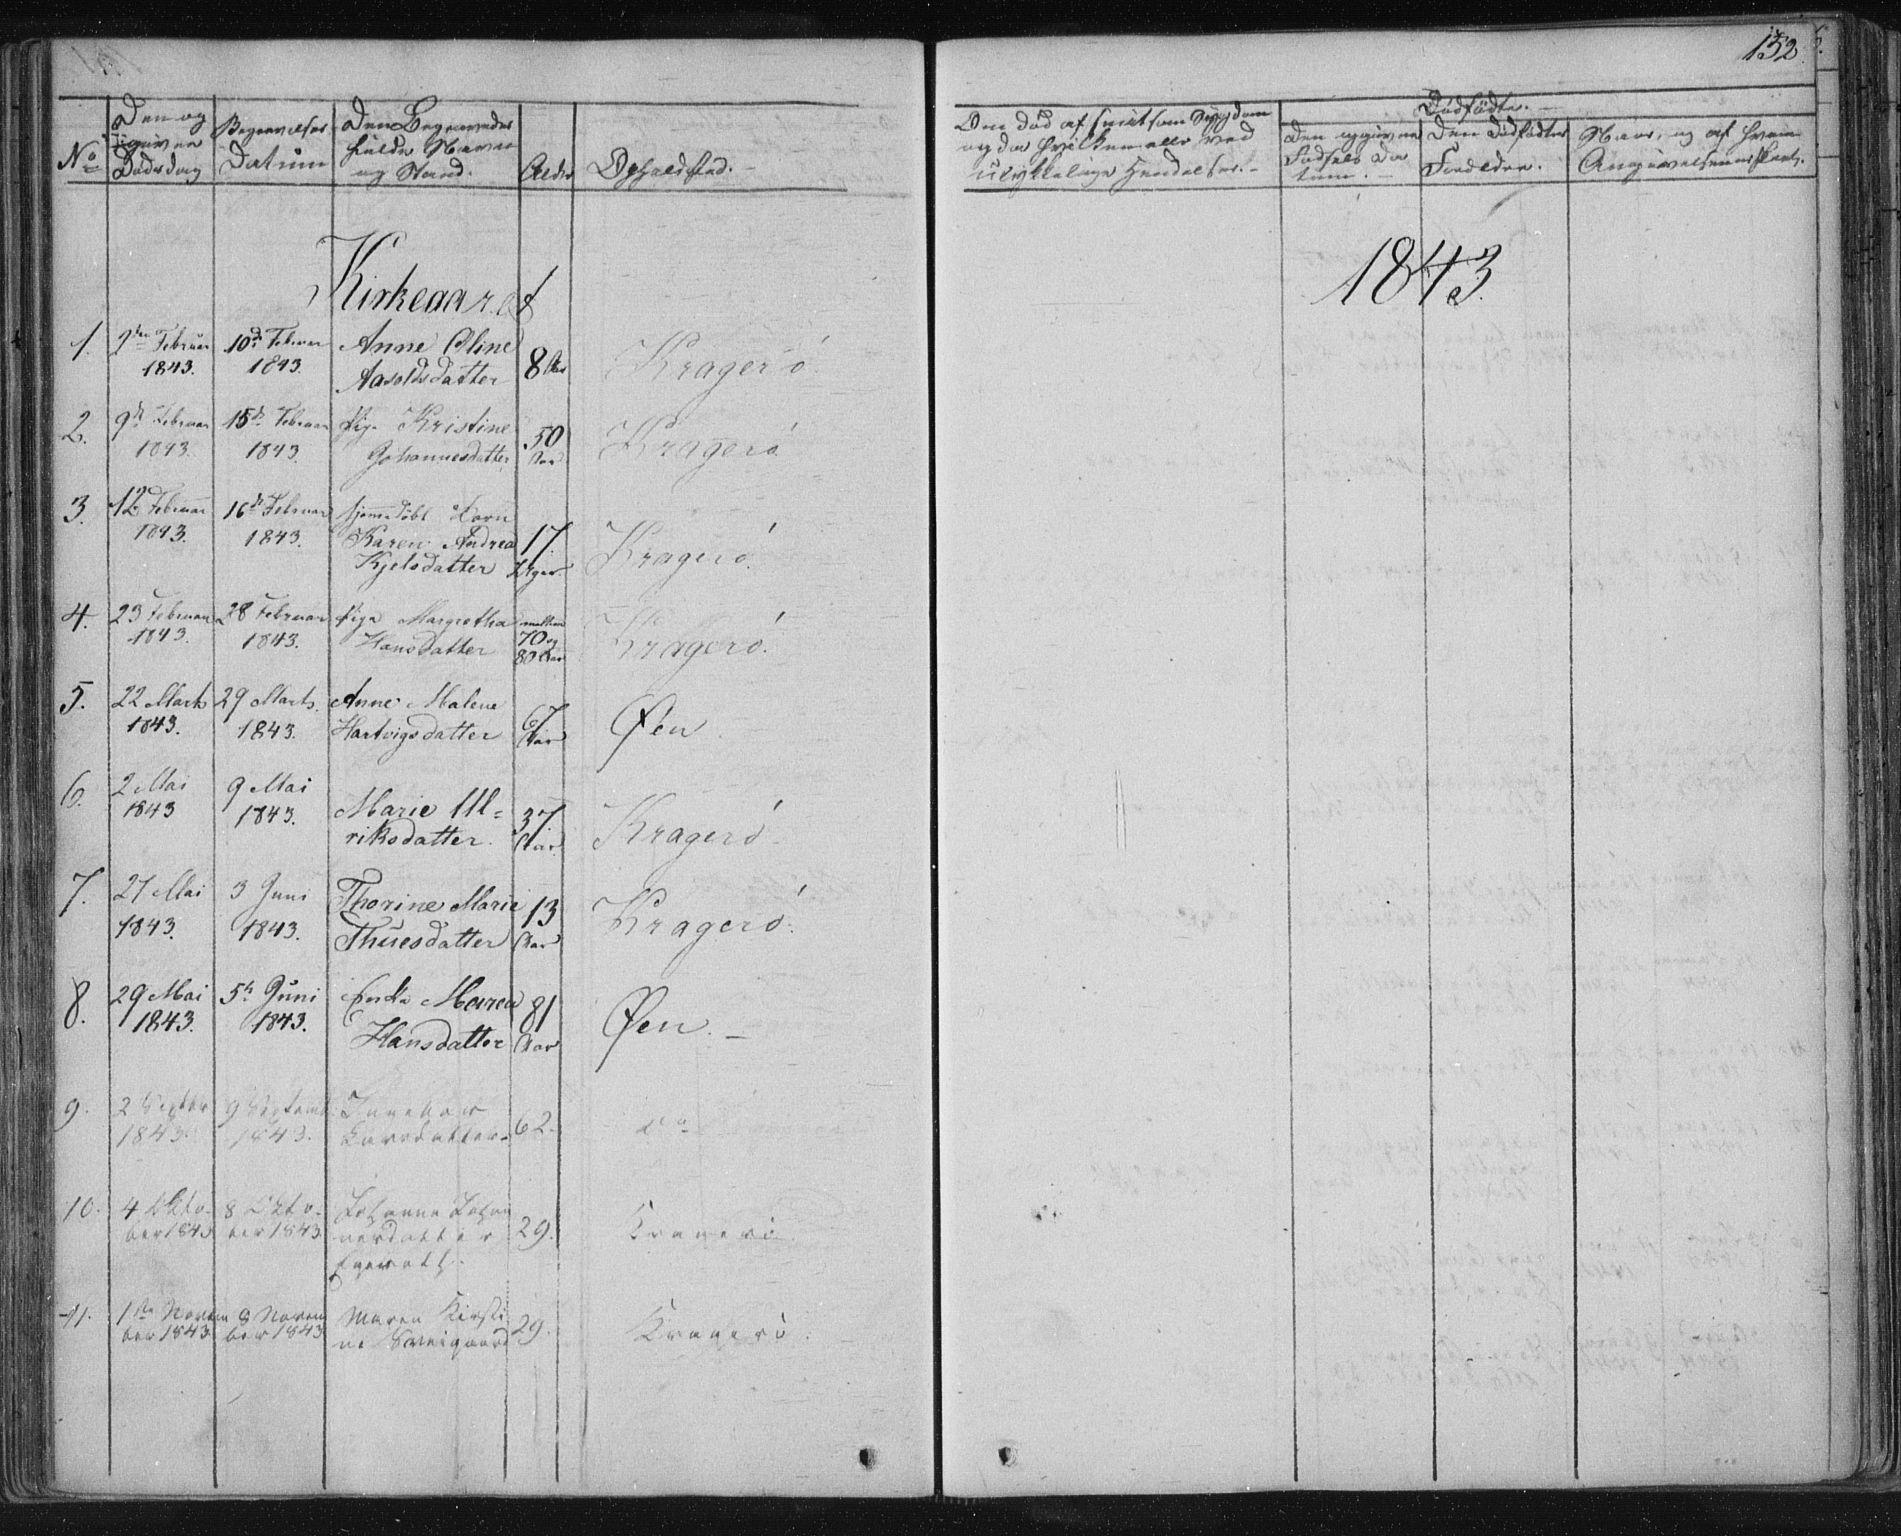 SAKO, Kragerø kirkebøker, F/Fa/L0005: Ministerialbok nr. 5, 1832-1847, s. 152